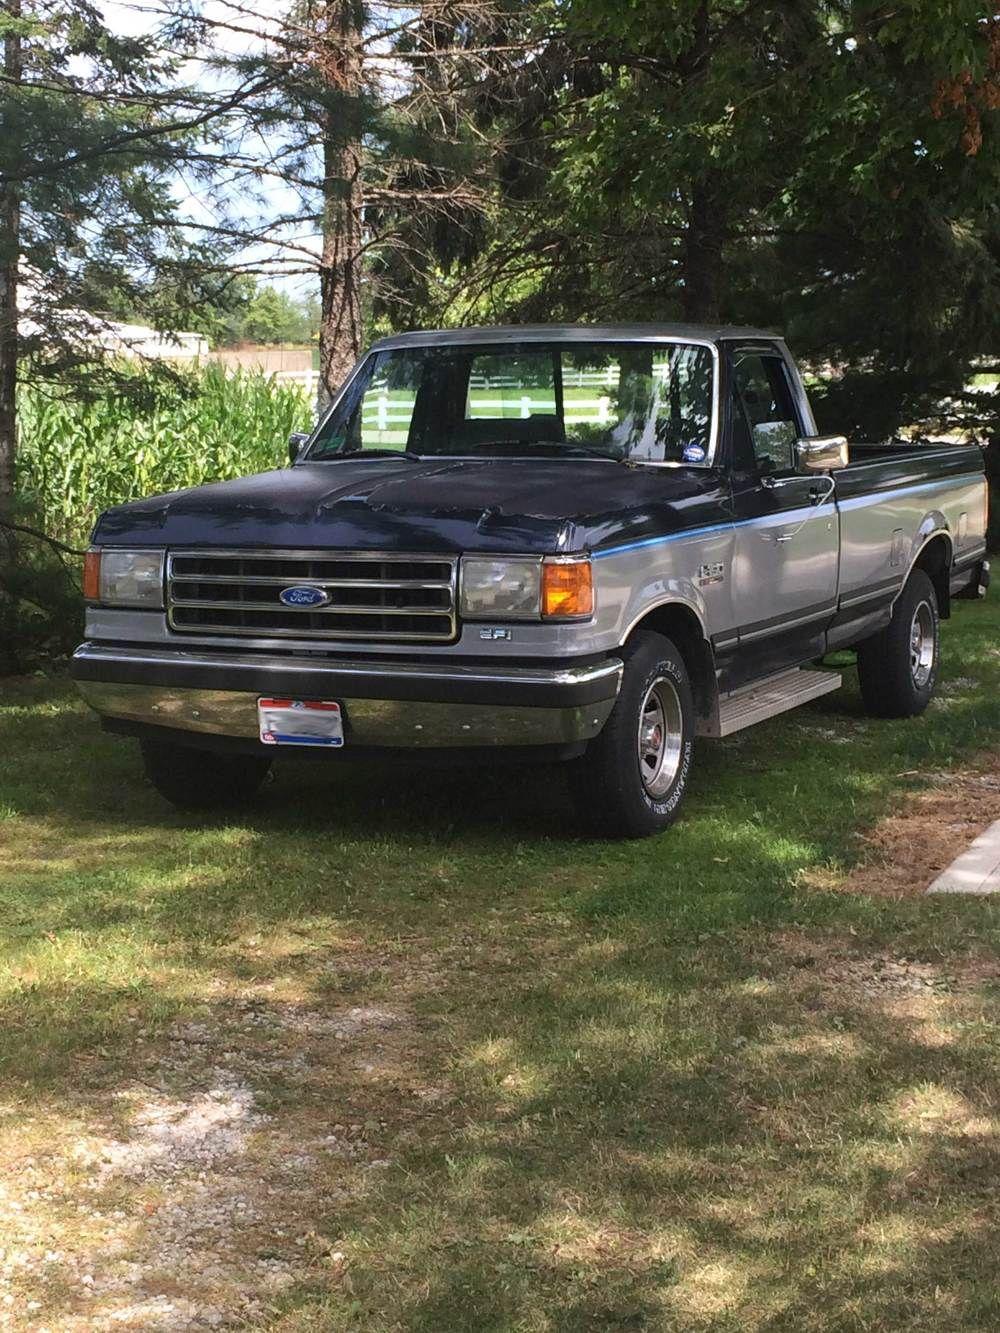 1989 Ford F150 Parts : parts, Truck, Trucks,, Ford,